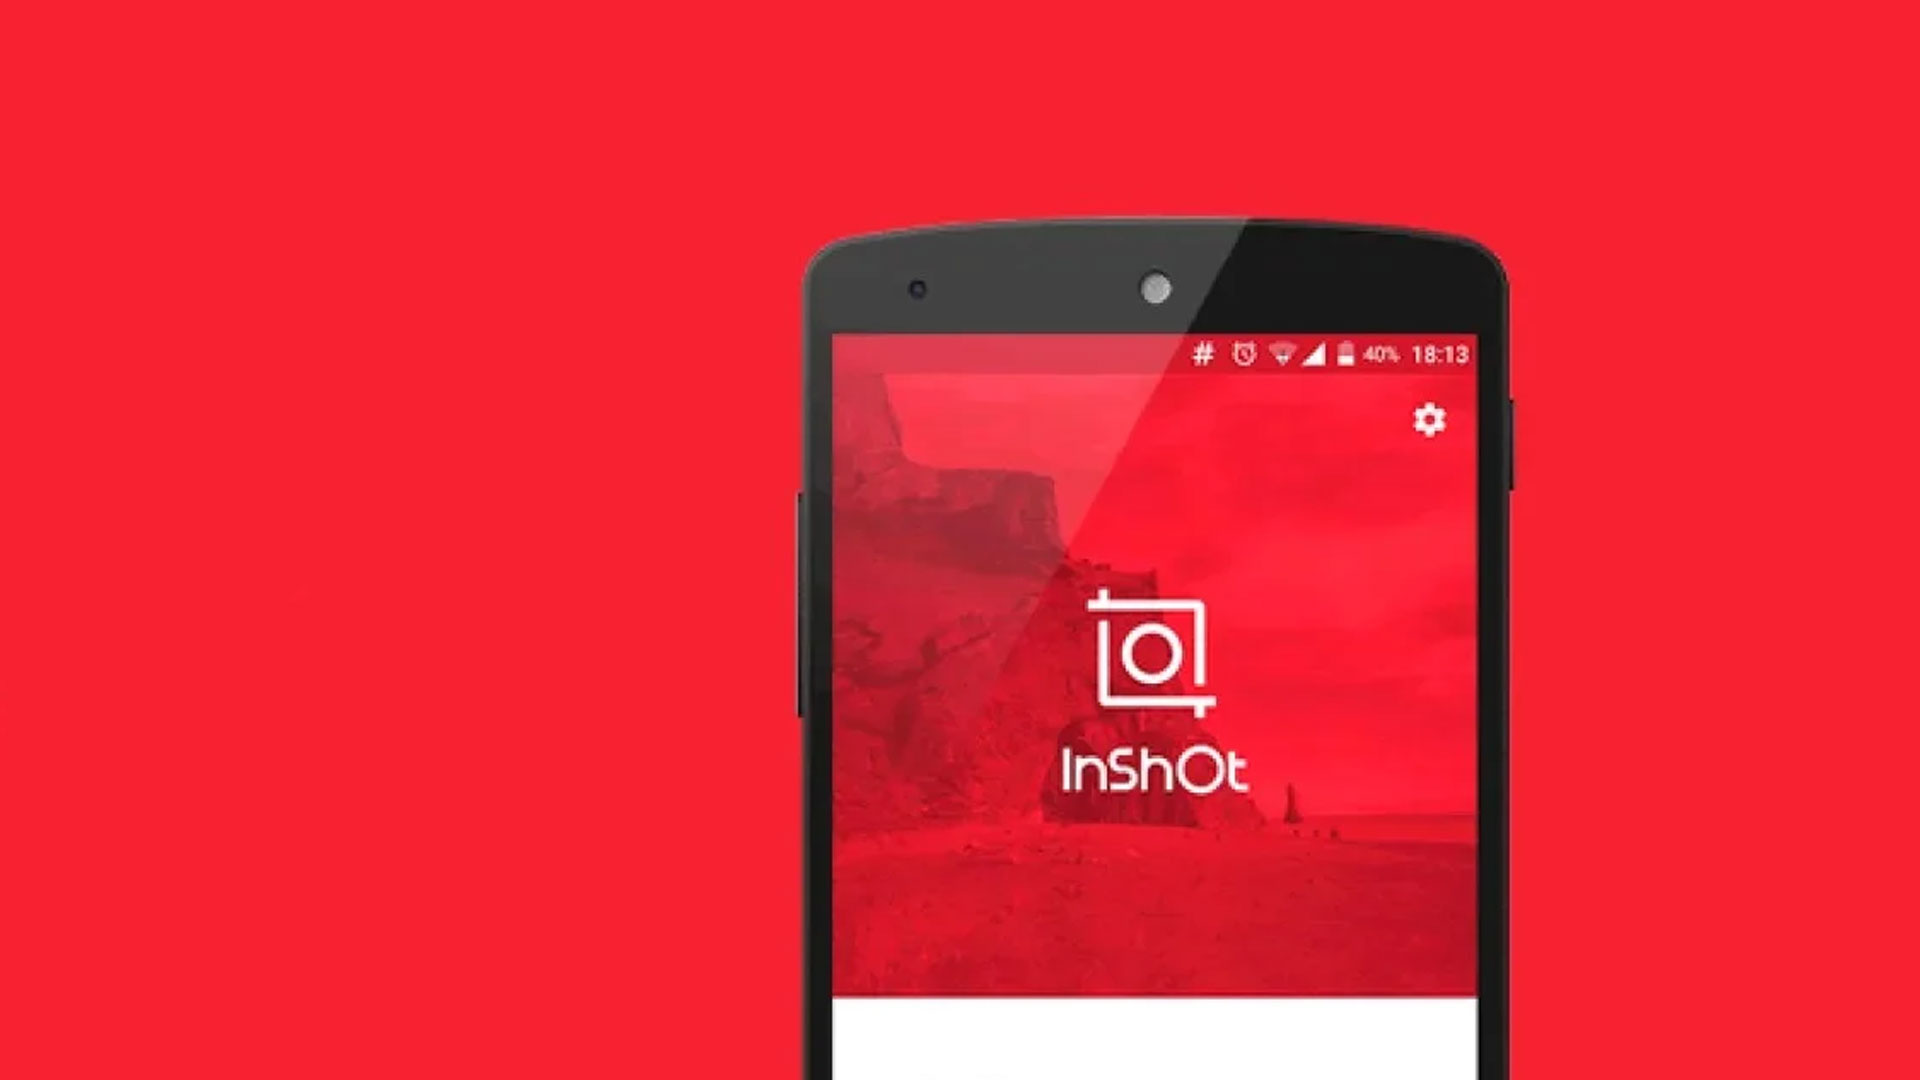 Download & Play Video Editor & Video Maker – InShot on PC & Mac (Emulator)